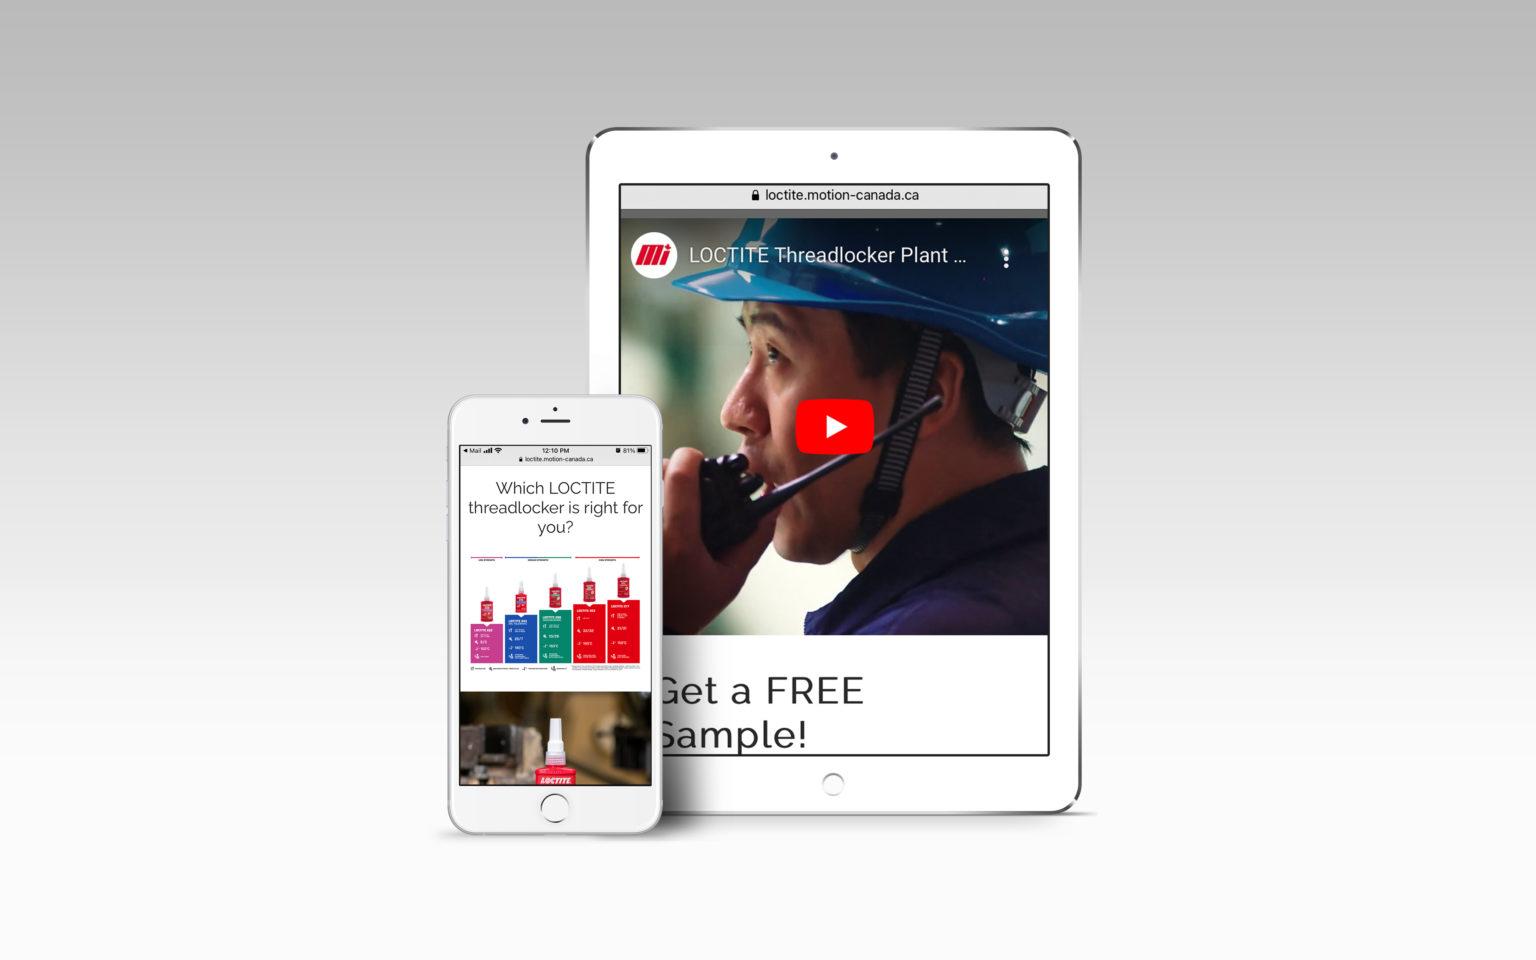 LOCTITE Landing Page Mockup Mobile